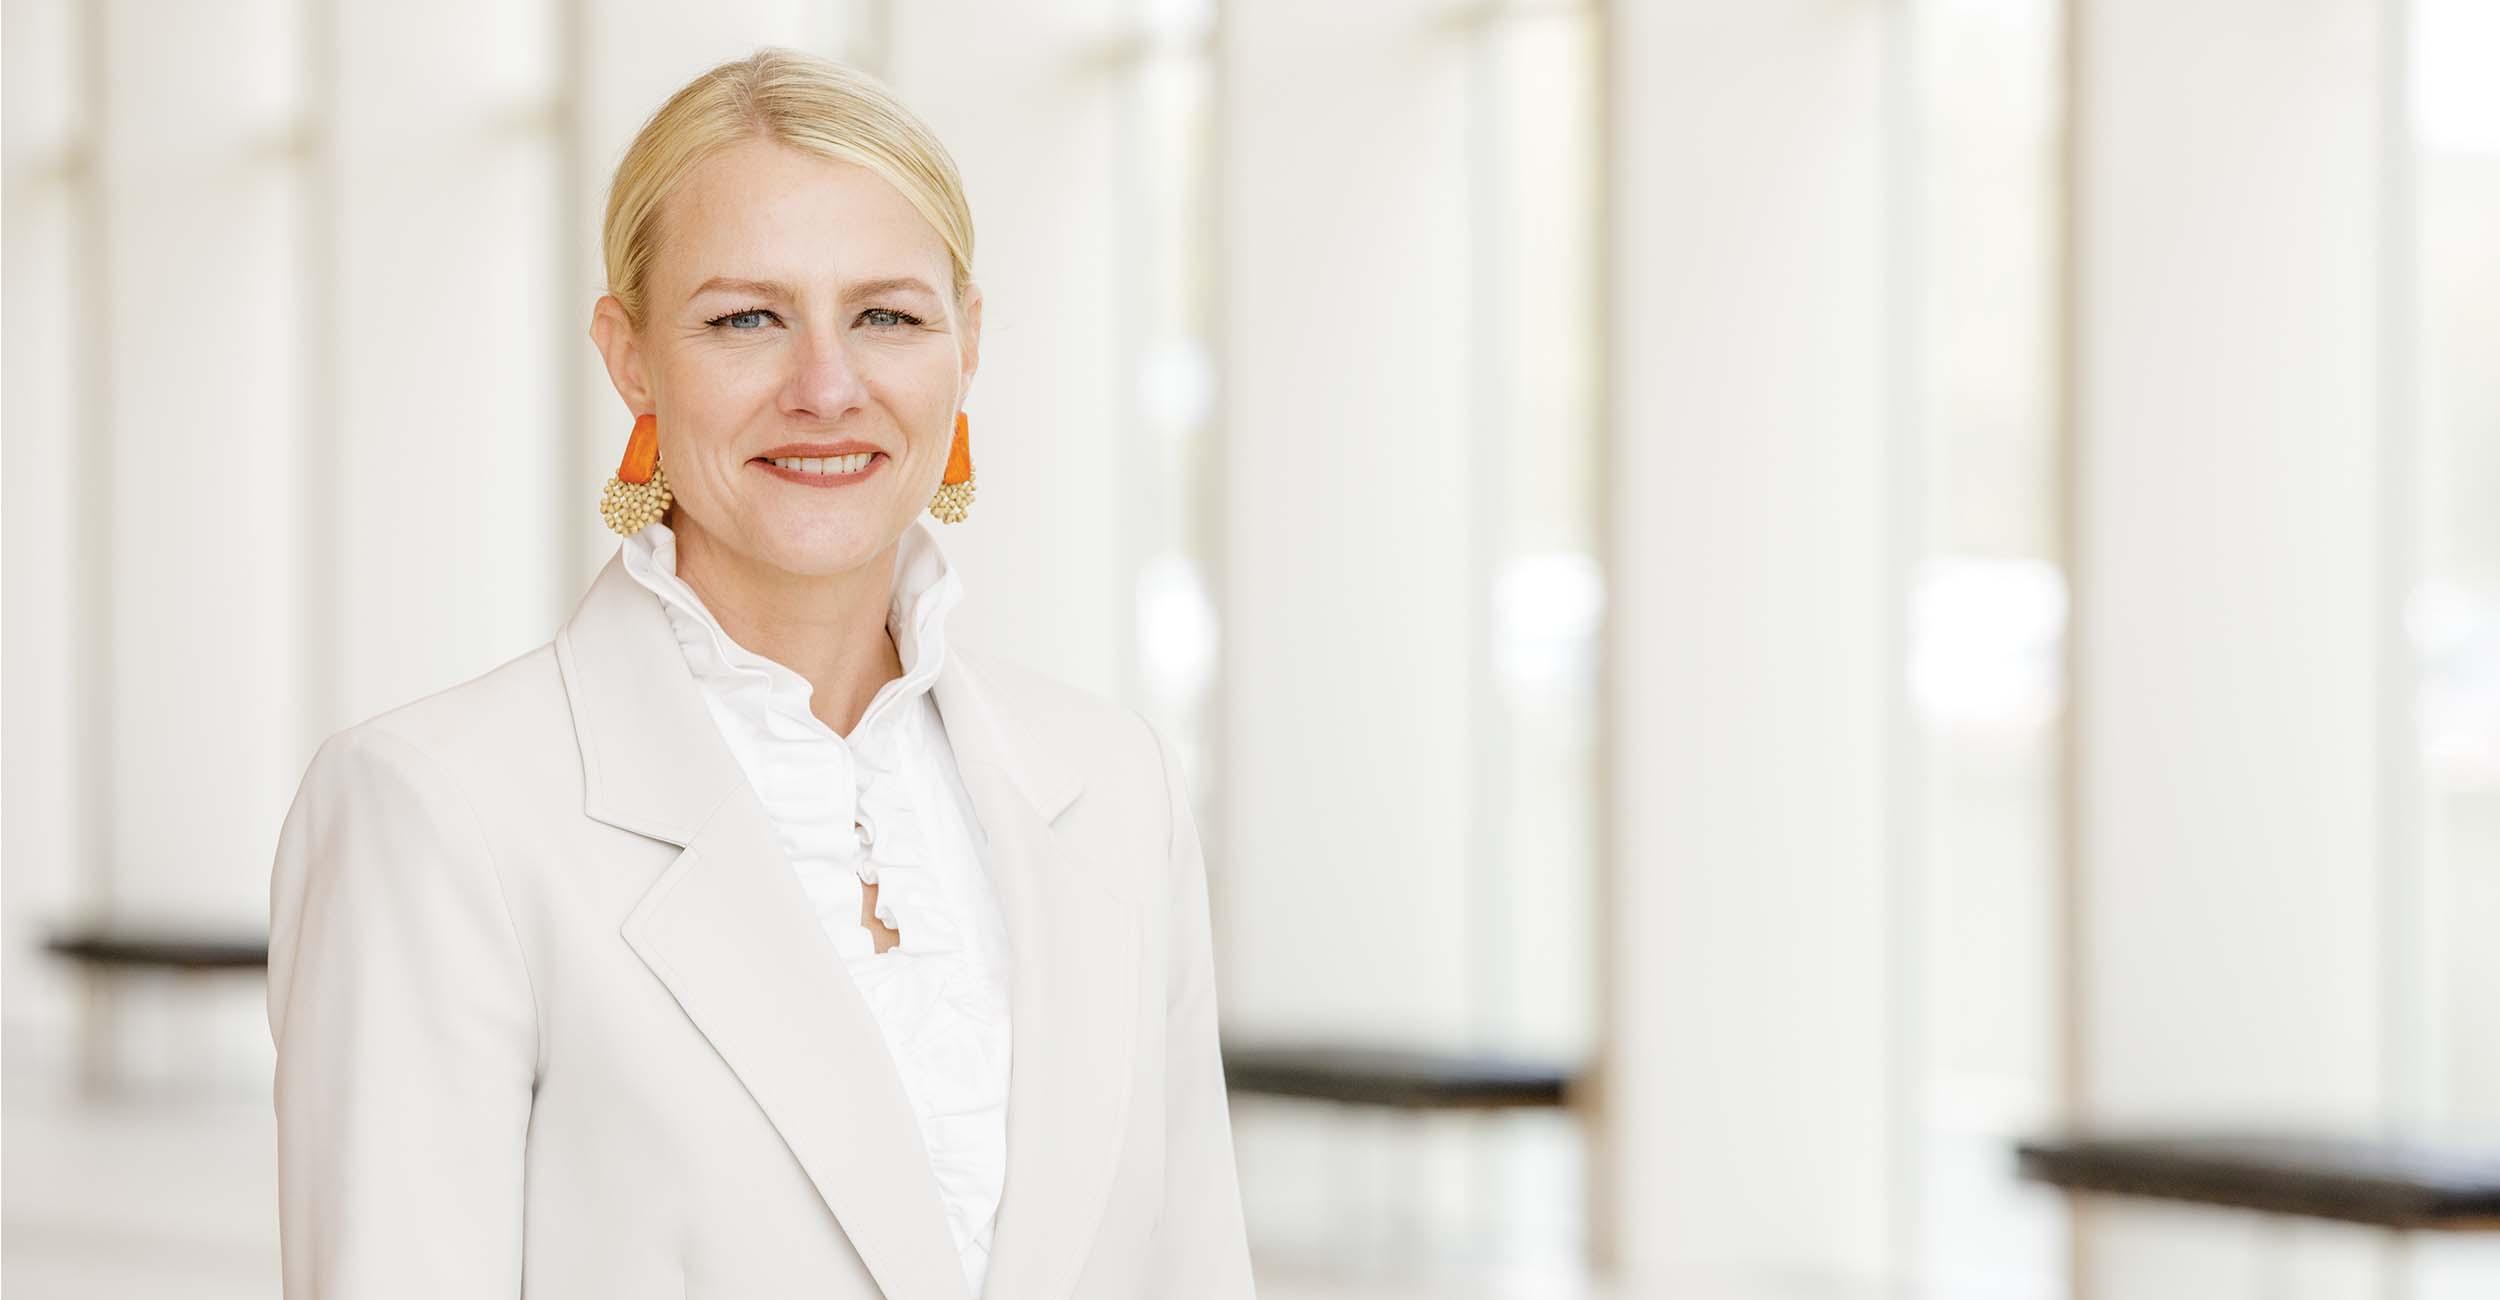 A portrait photo of OSU President Kayse Shrum.